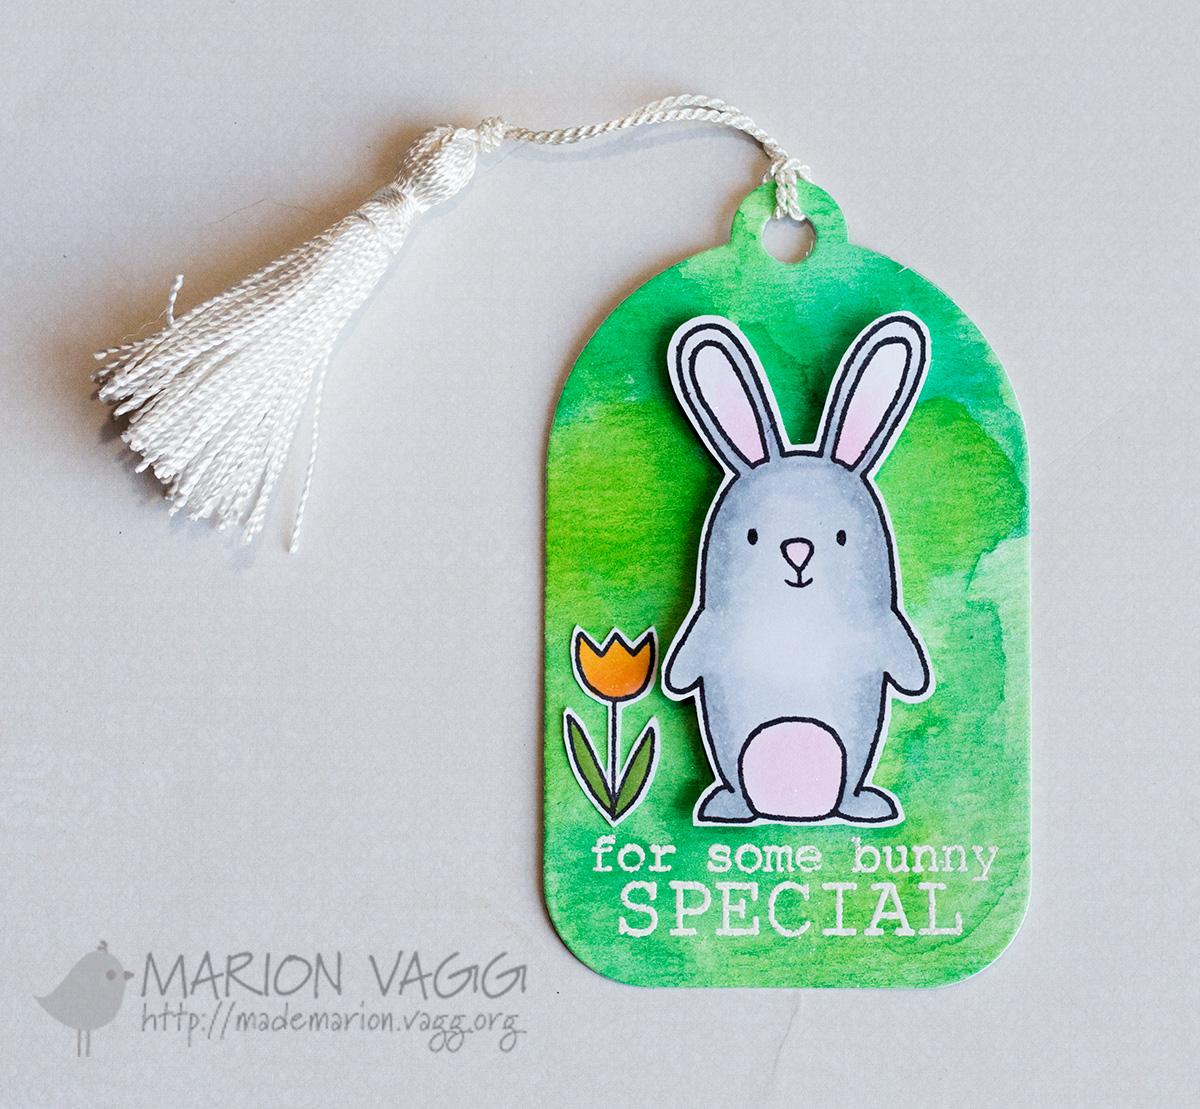 Special Bunny JD | Marion Vagg